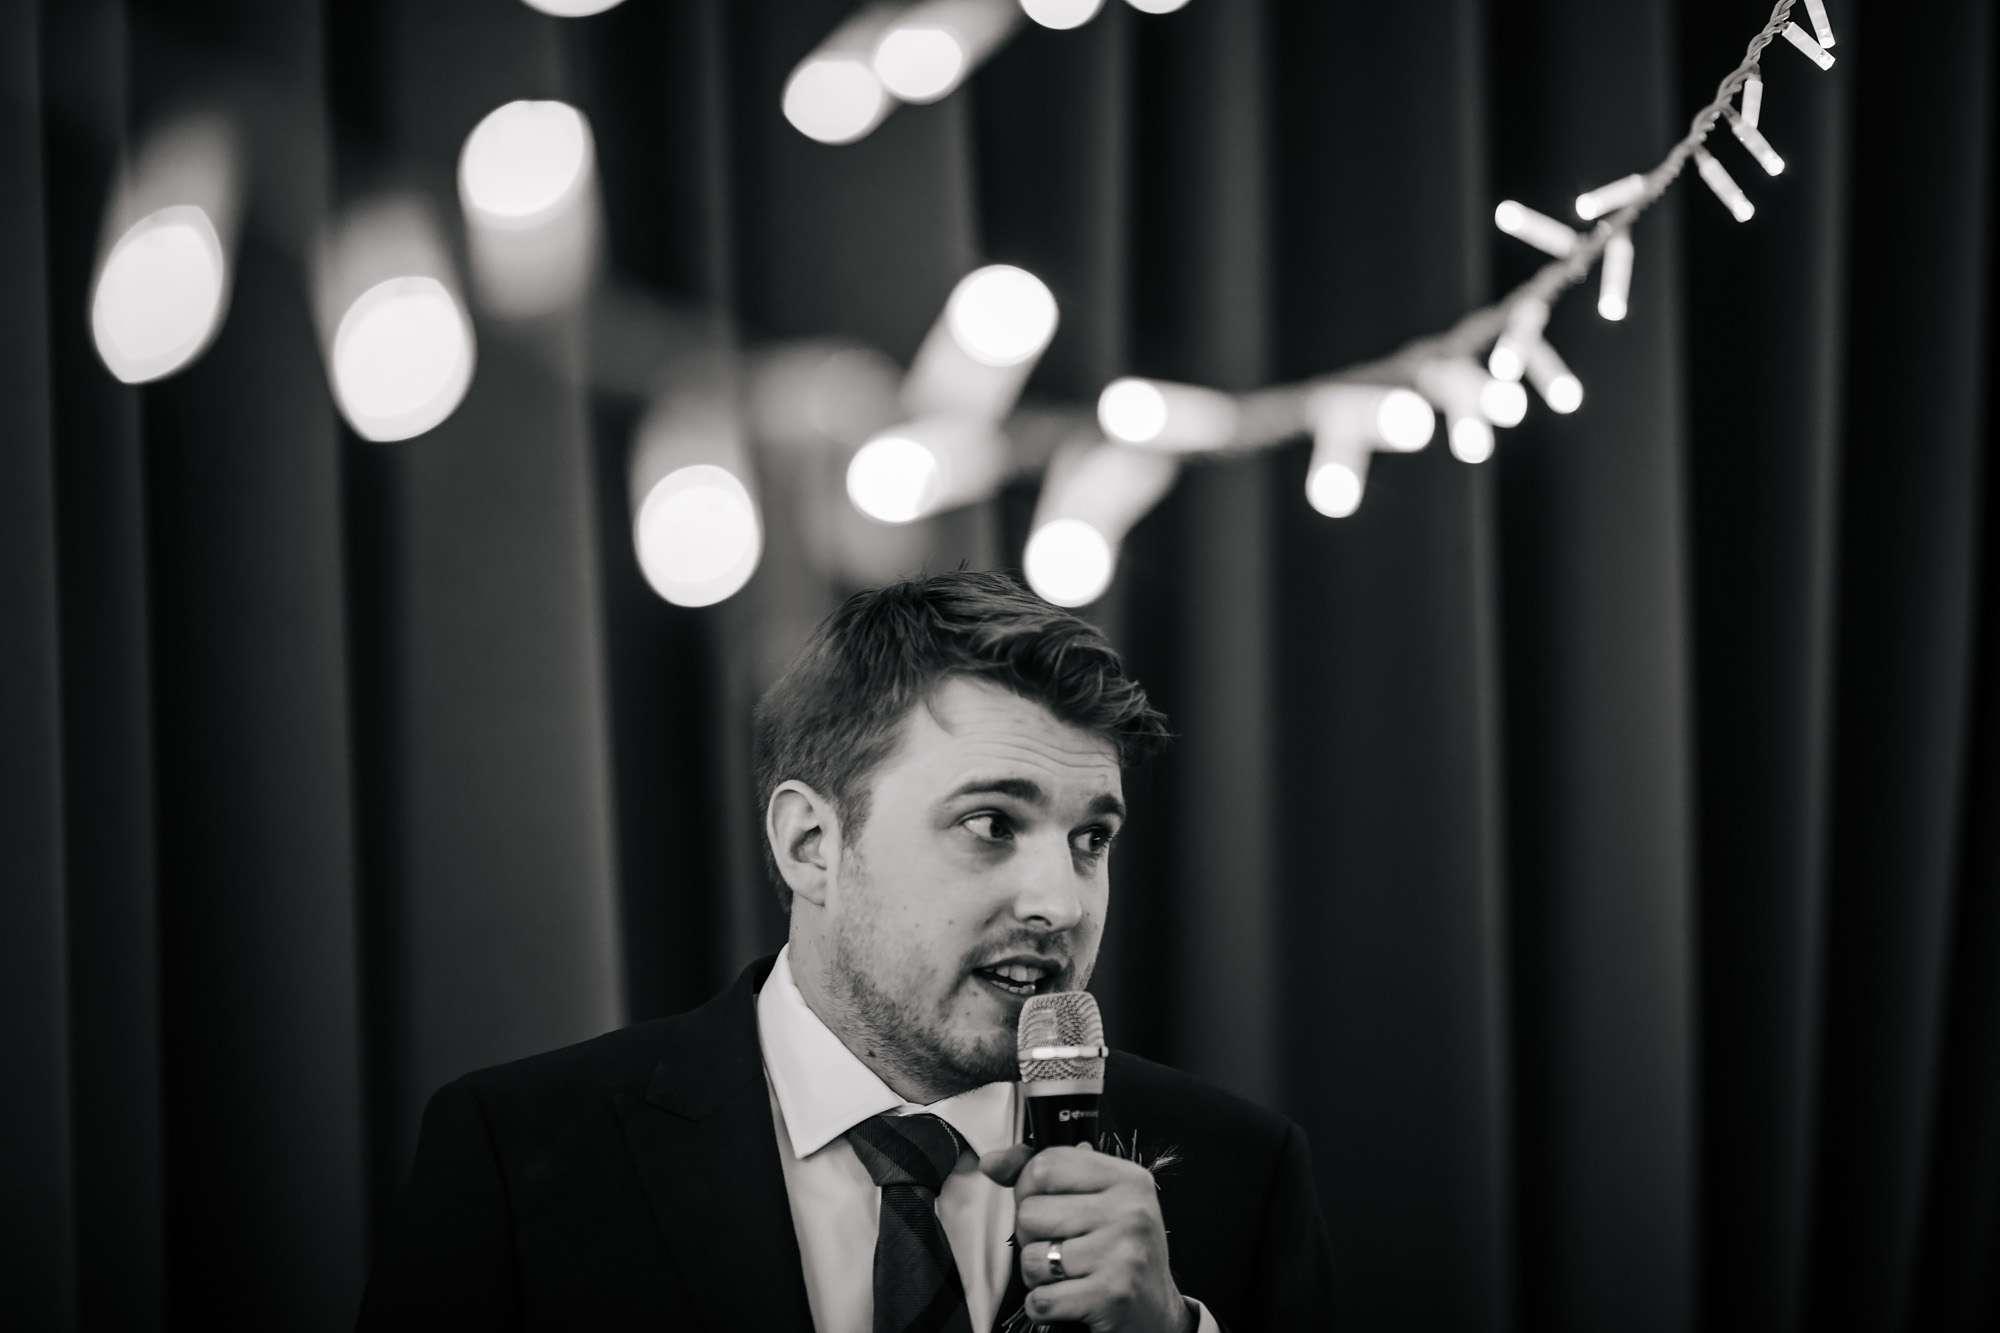 Groom's wedding speech at East Keswick Village Hall